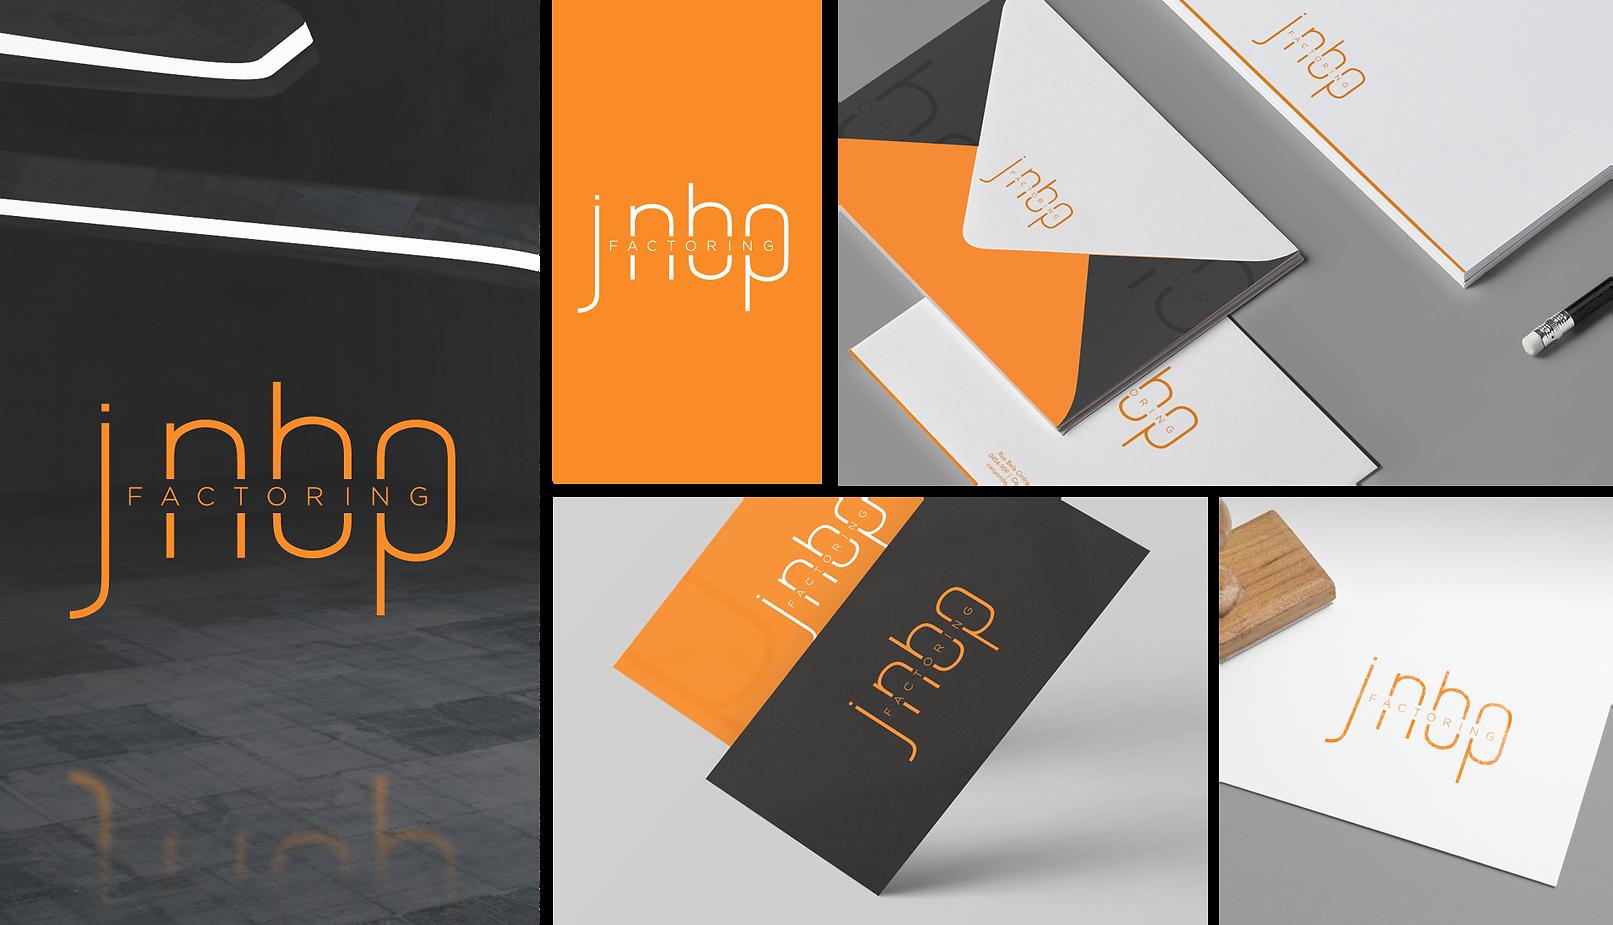 JNBP_Imagem_Arte.png